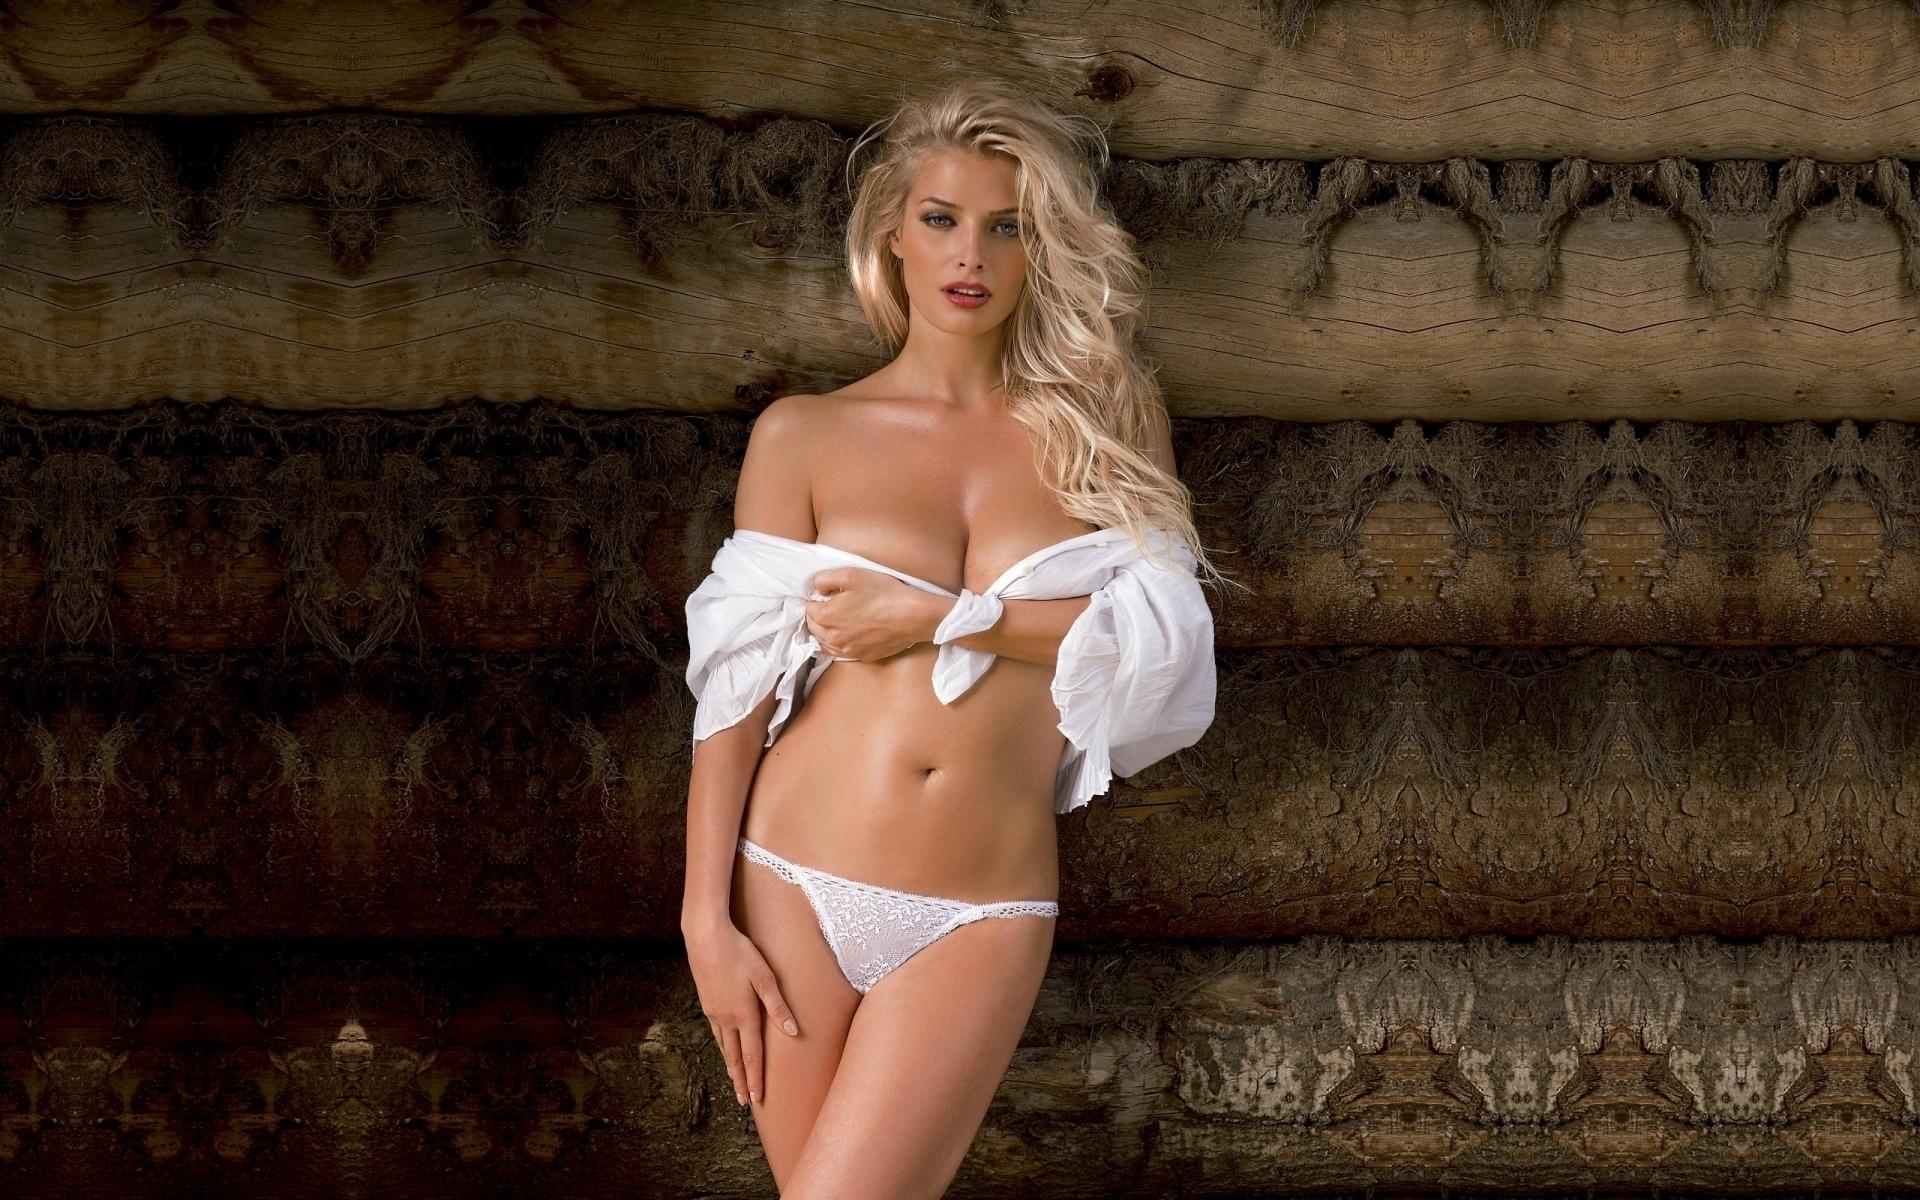 Фото секси в трусики 3 фотография